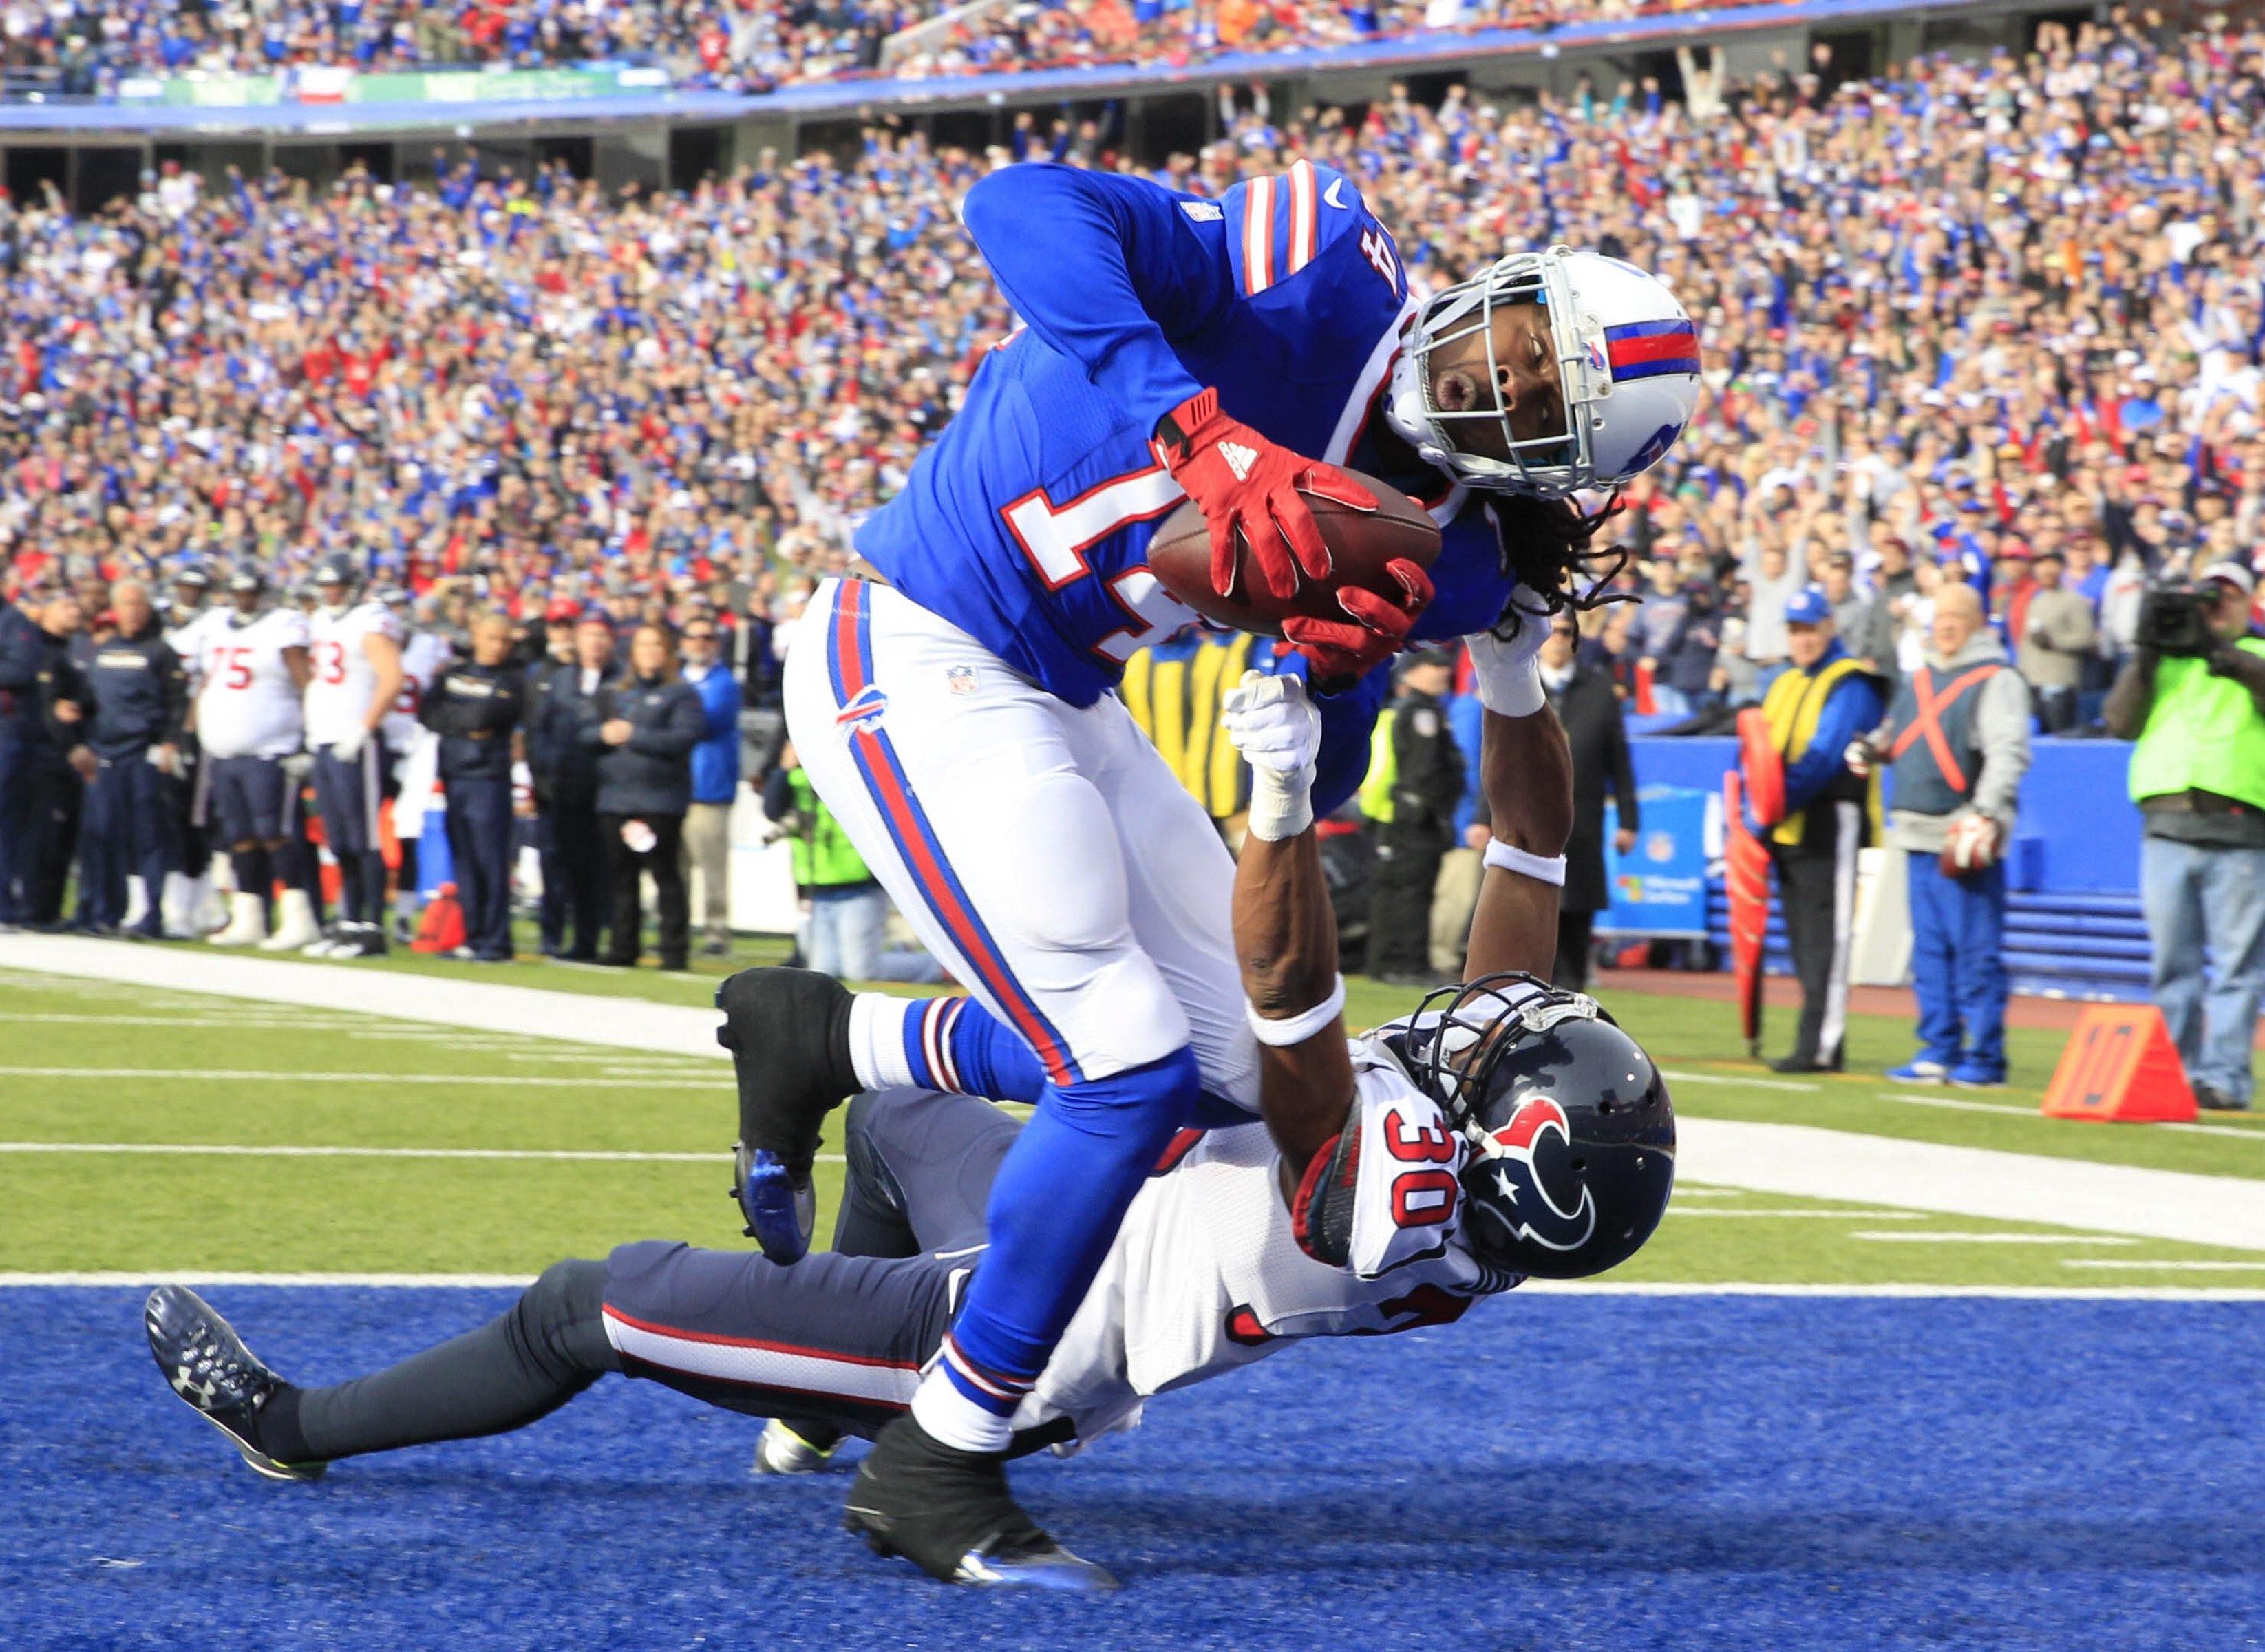 Bills receiver Sammy Watkins catches a 3-yard pass for a touchdown under pressure from Texans cornerback Kevin Johnson.